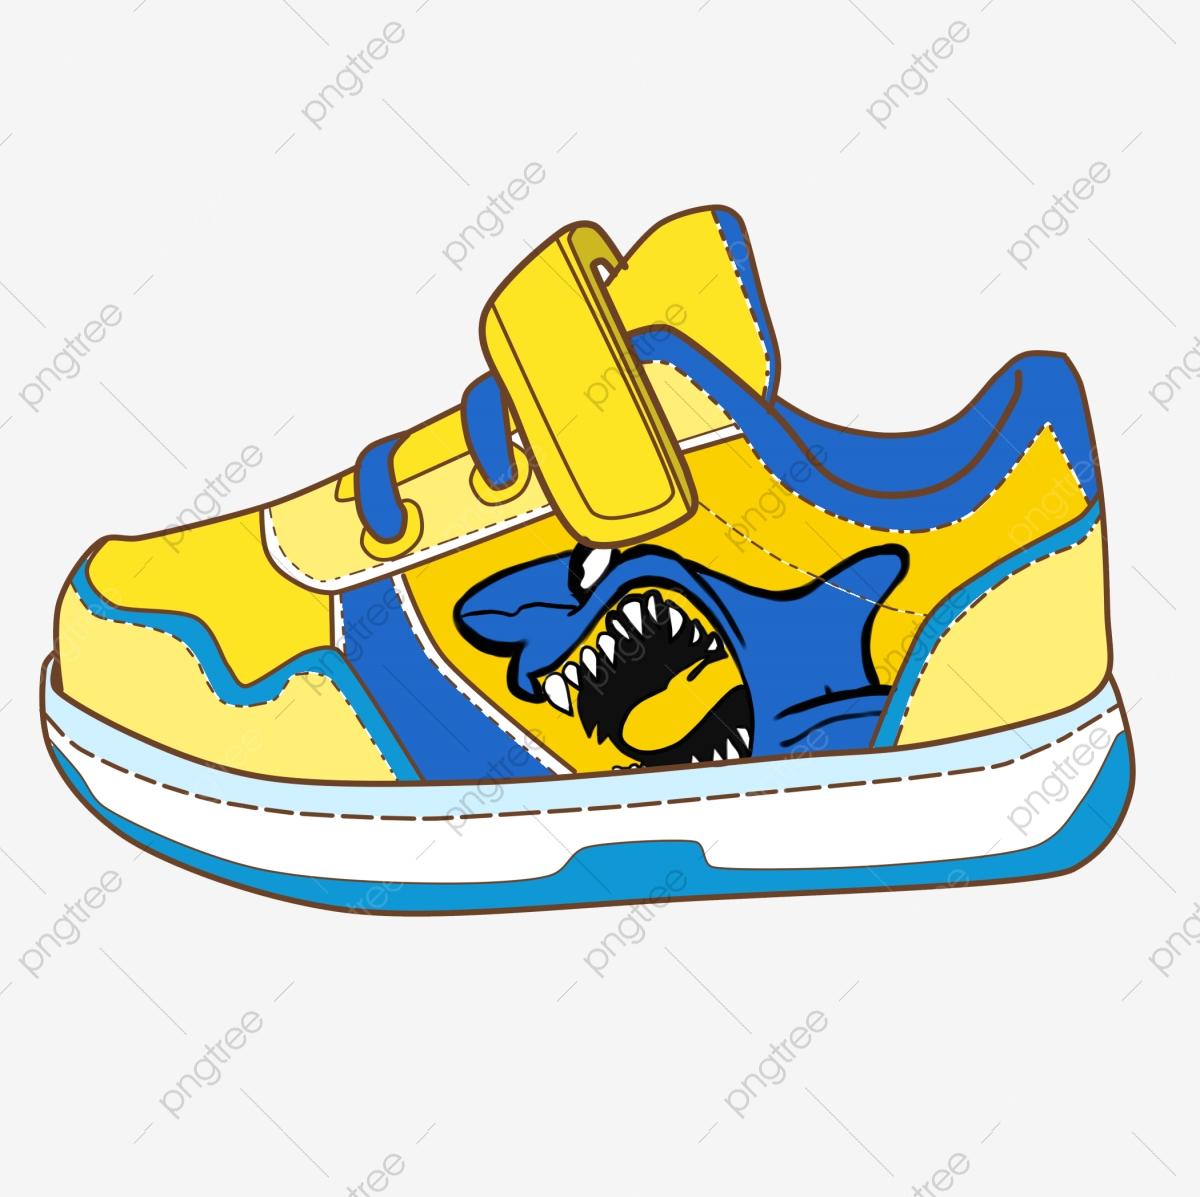 Blue Baby Shoes, Baby Clipart, Shoes Clipart, Blue PNG Transparent.